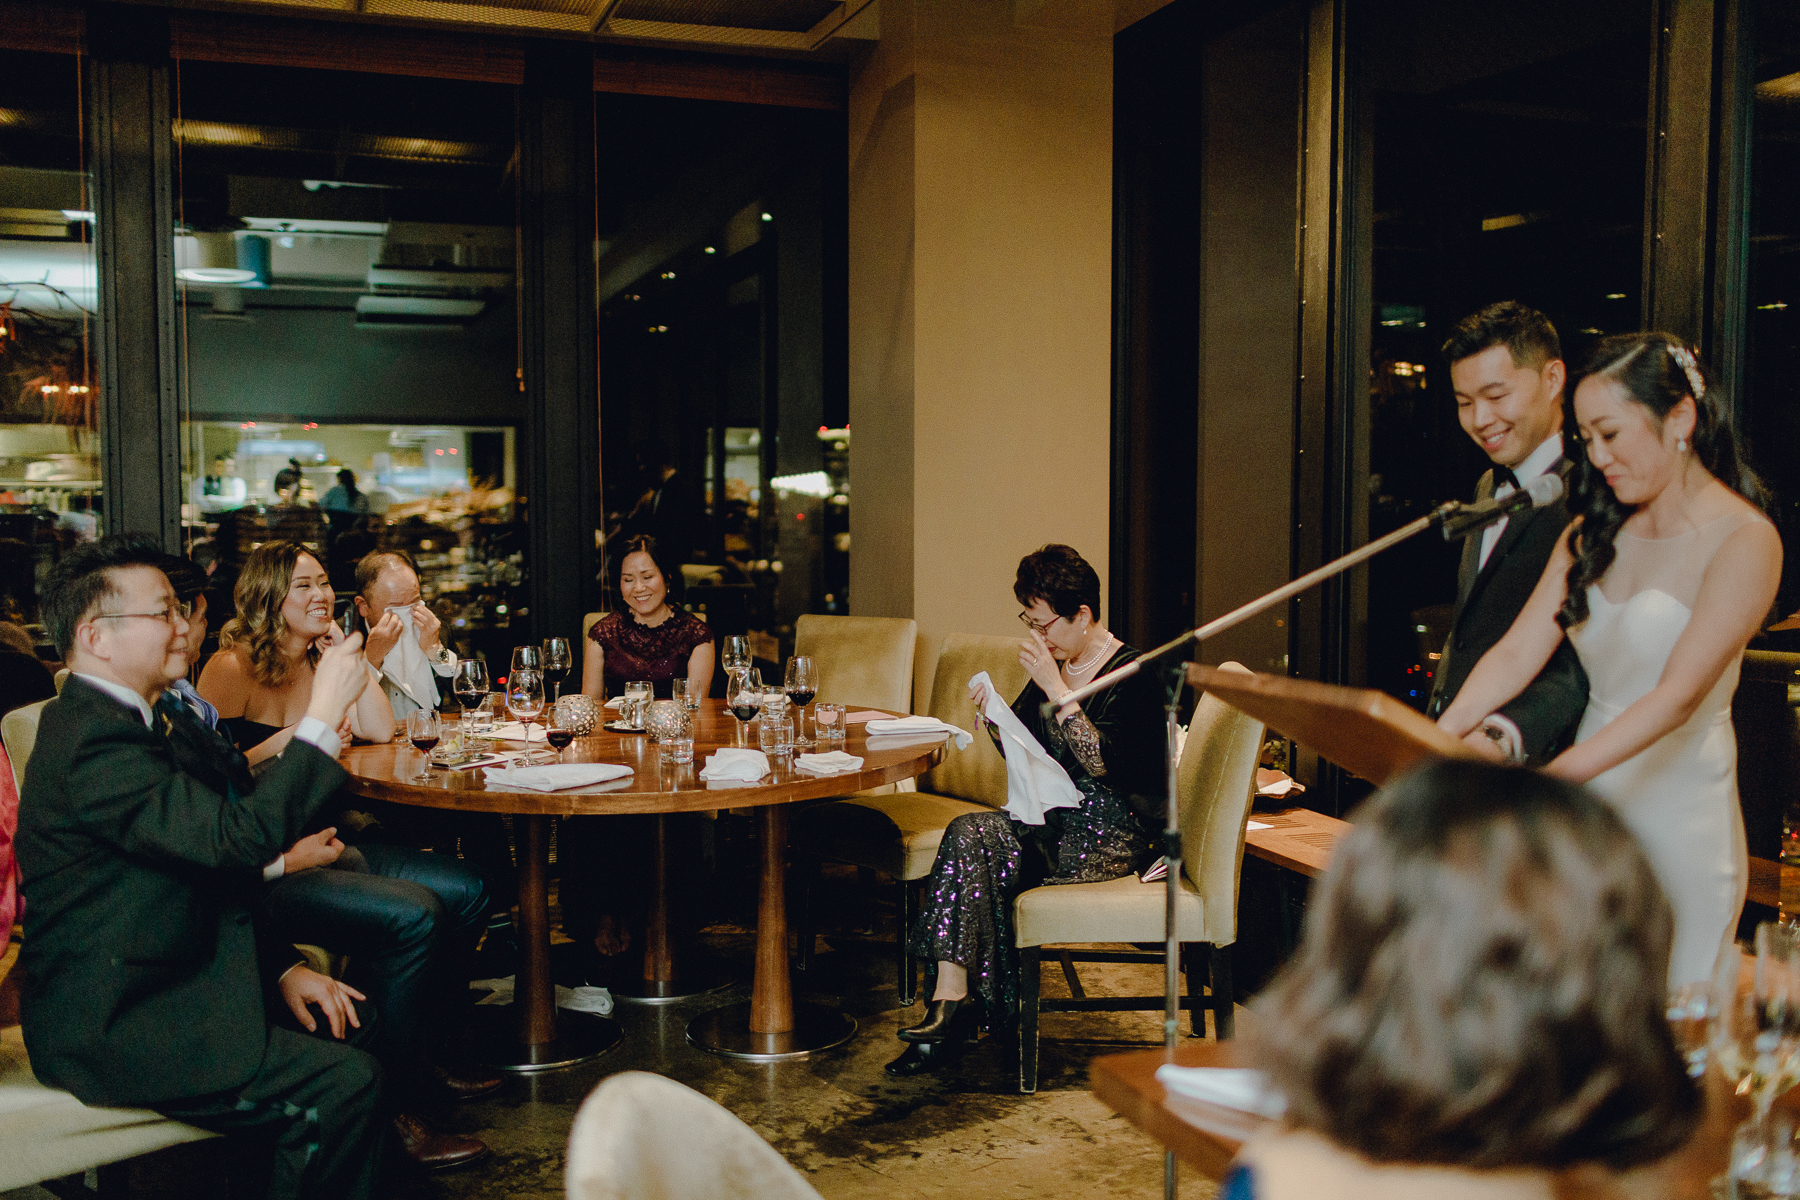 cannoe-restaurannt-wedding 0100.jpg